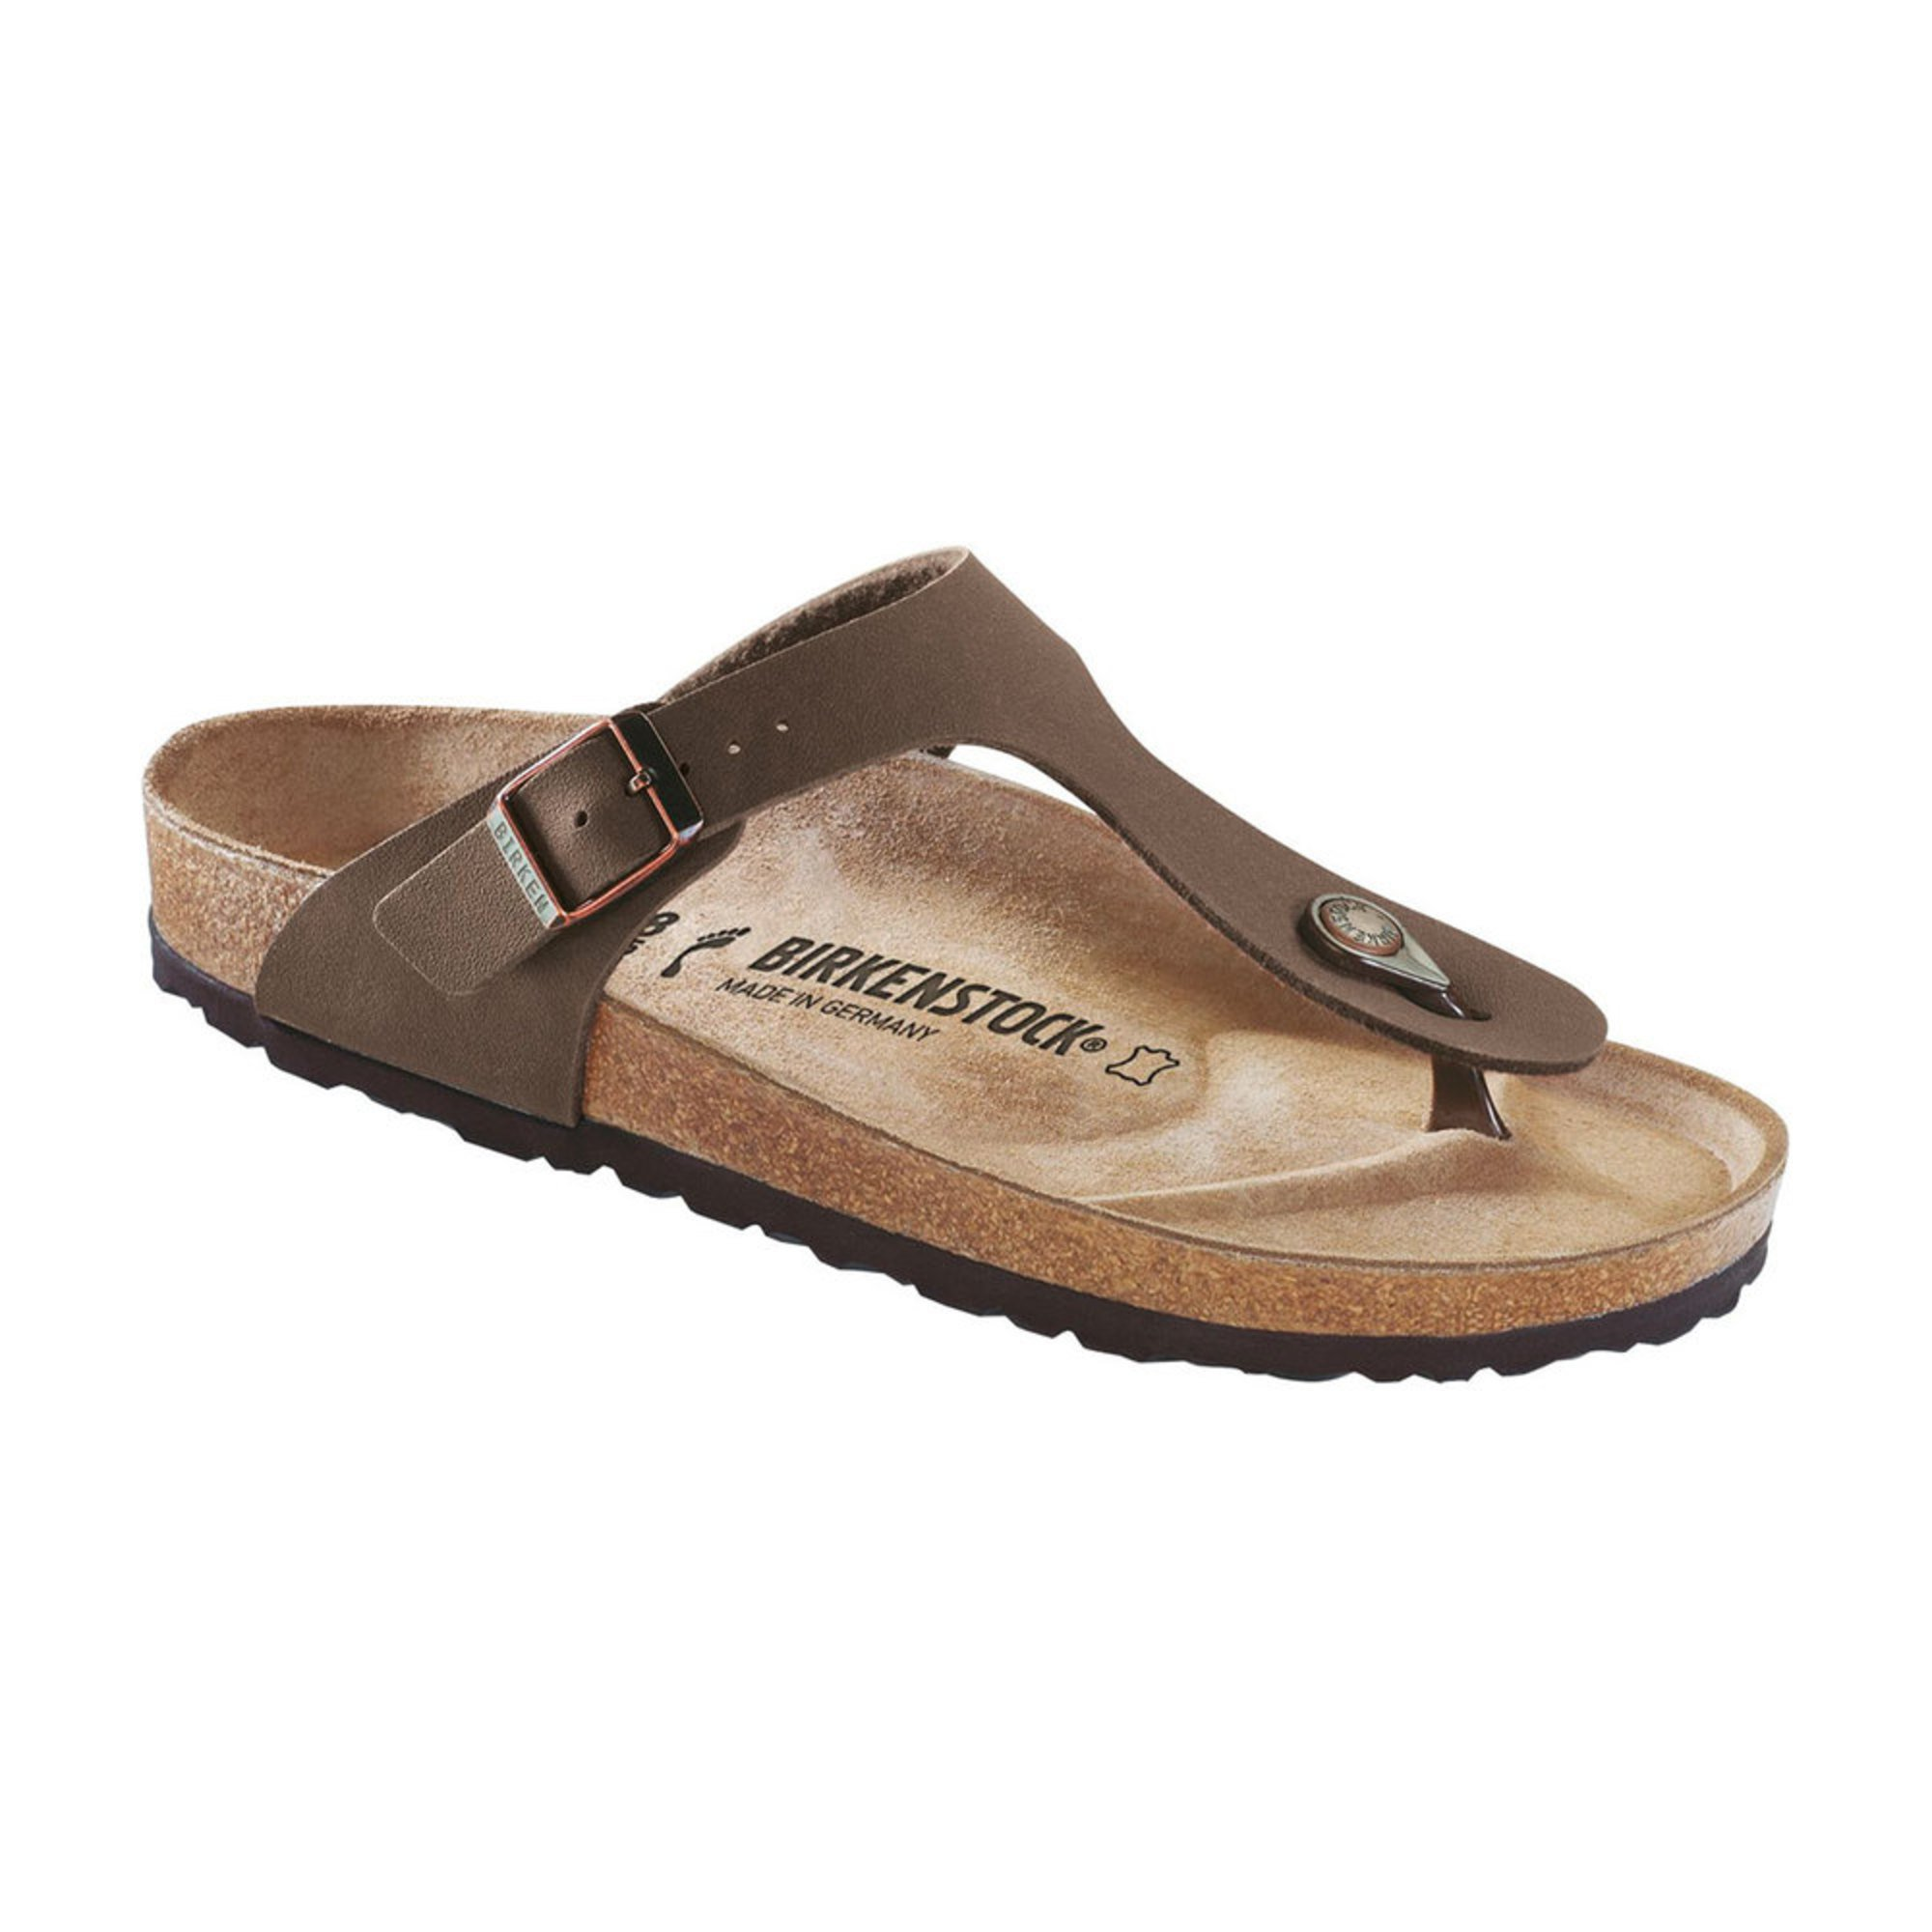 2284e551930 Birkenstock. Birkenstock Women s Gizeh Birkibuc Sandal